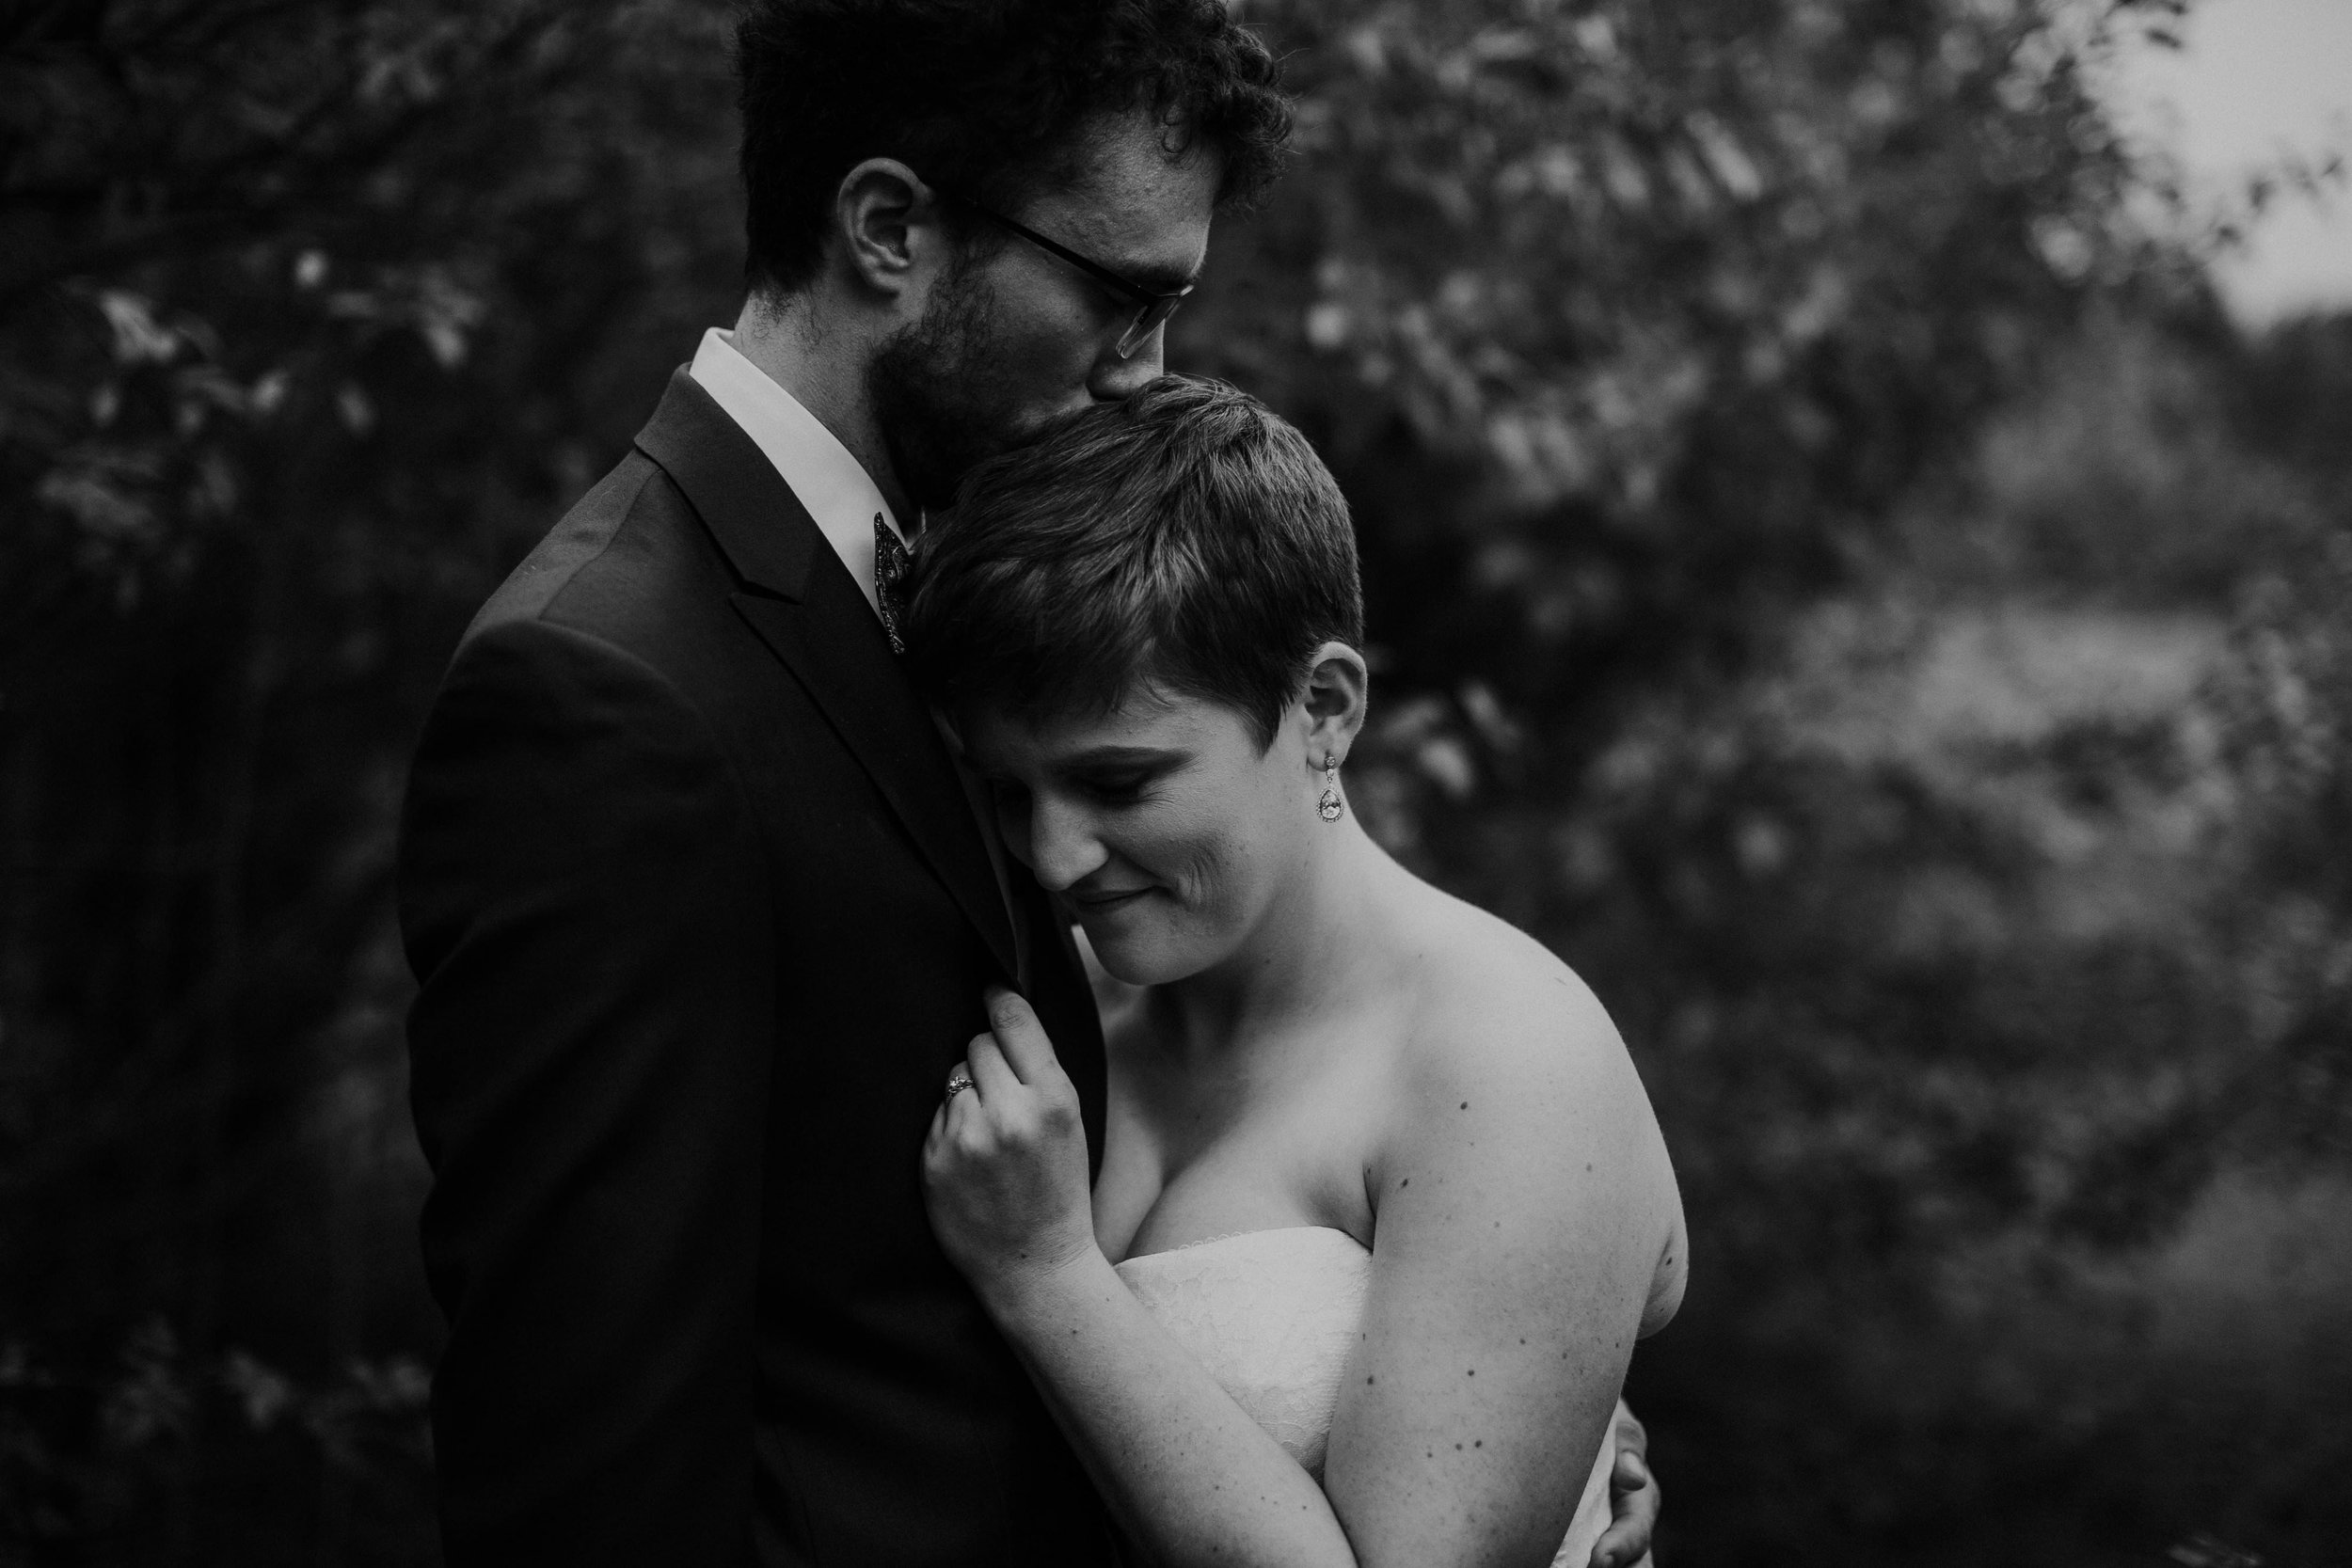 Columbus ohio wedding photographer grace e jones photography real fun joyful wedding22.jpg